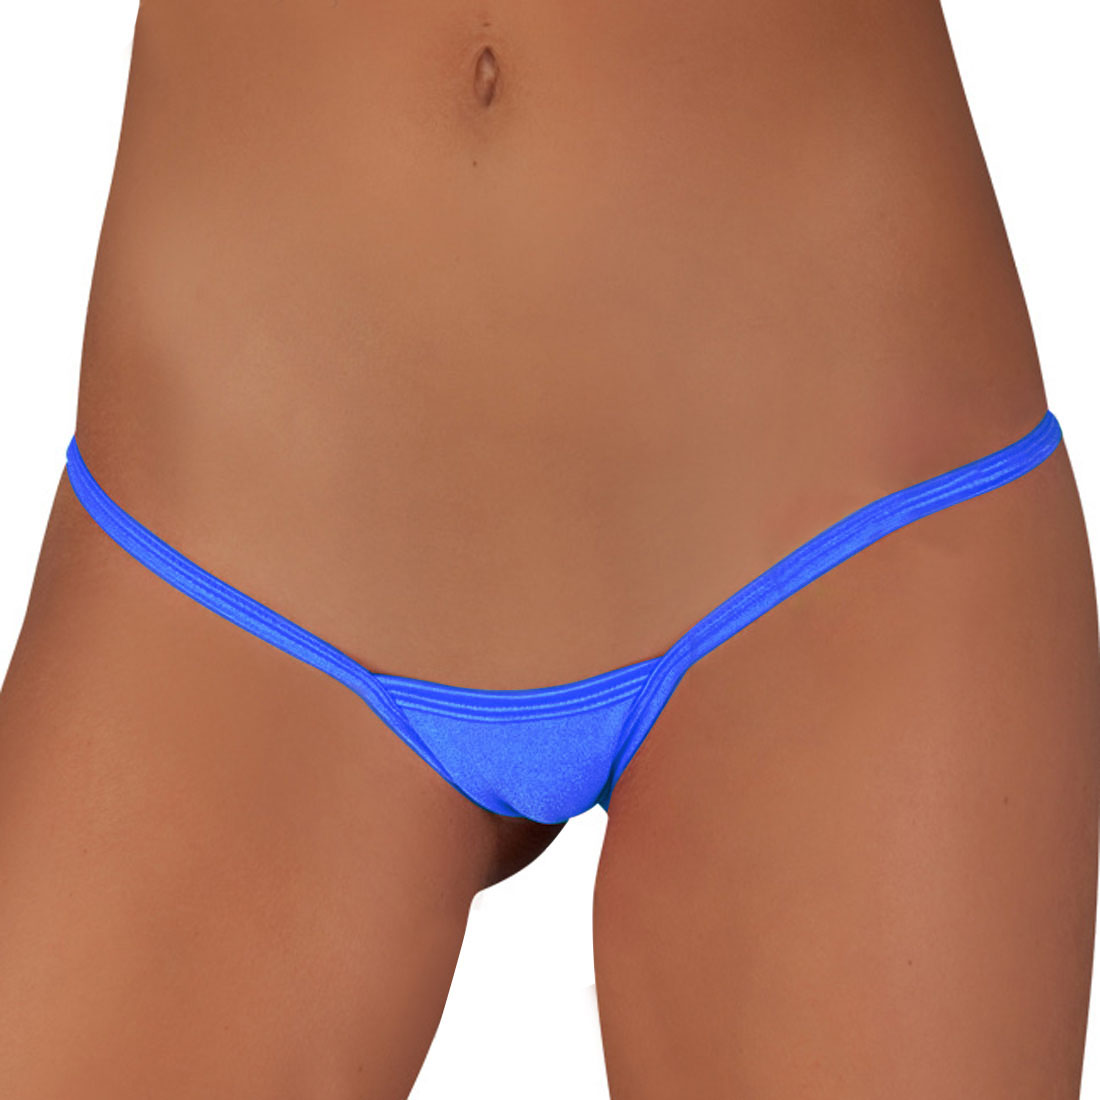 Womens Sexy Lingerie G-Strings Thongs Micro Thong Mini Panties ...